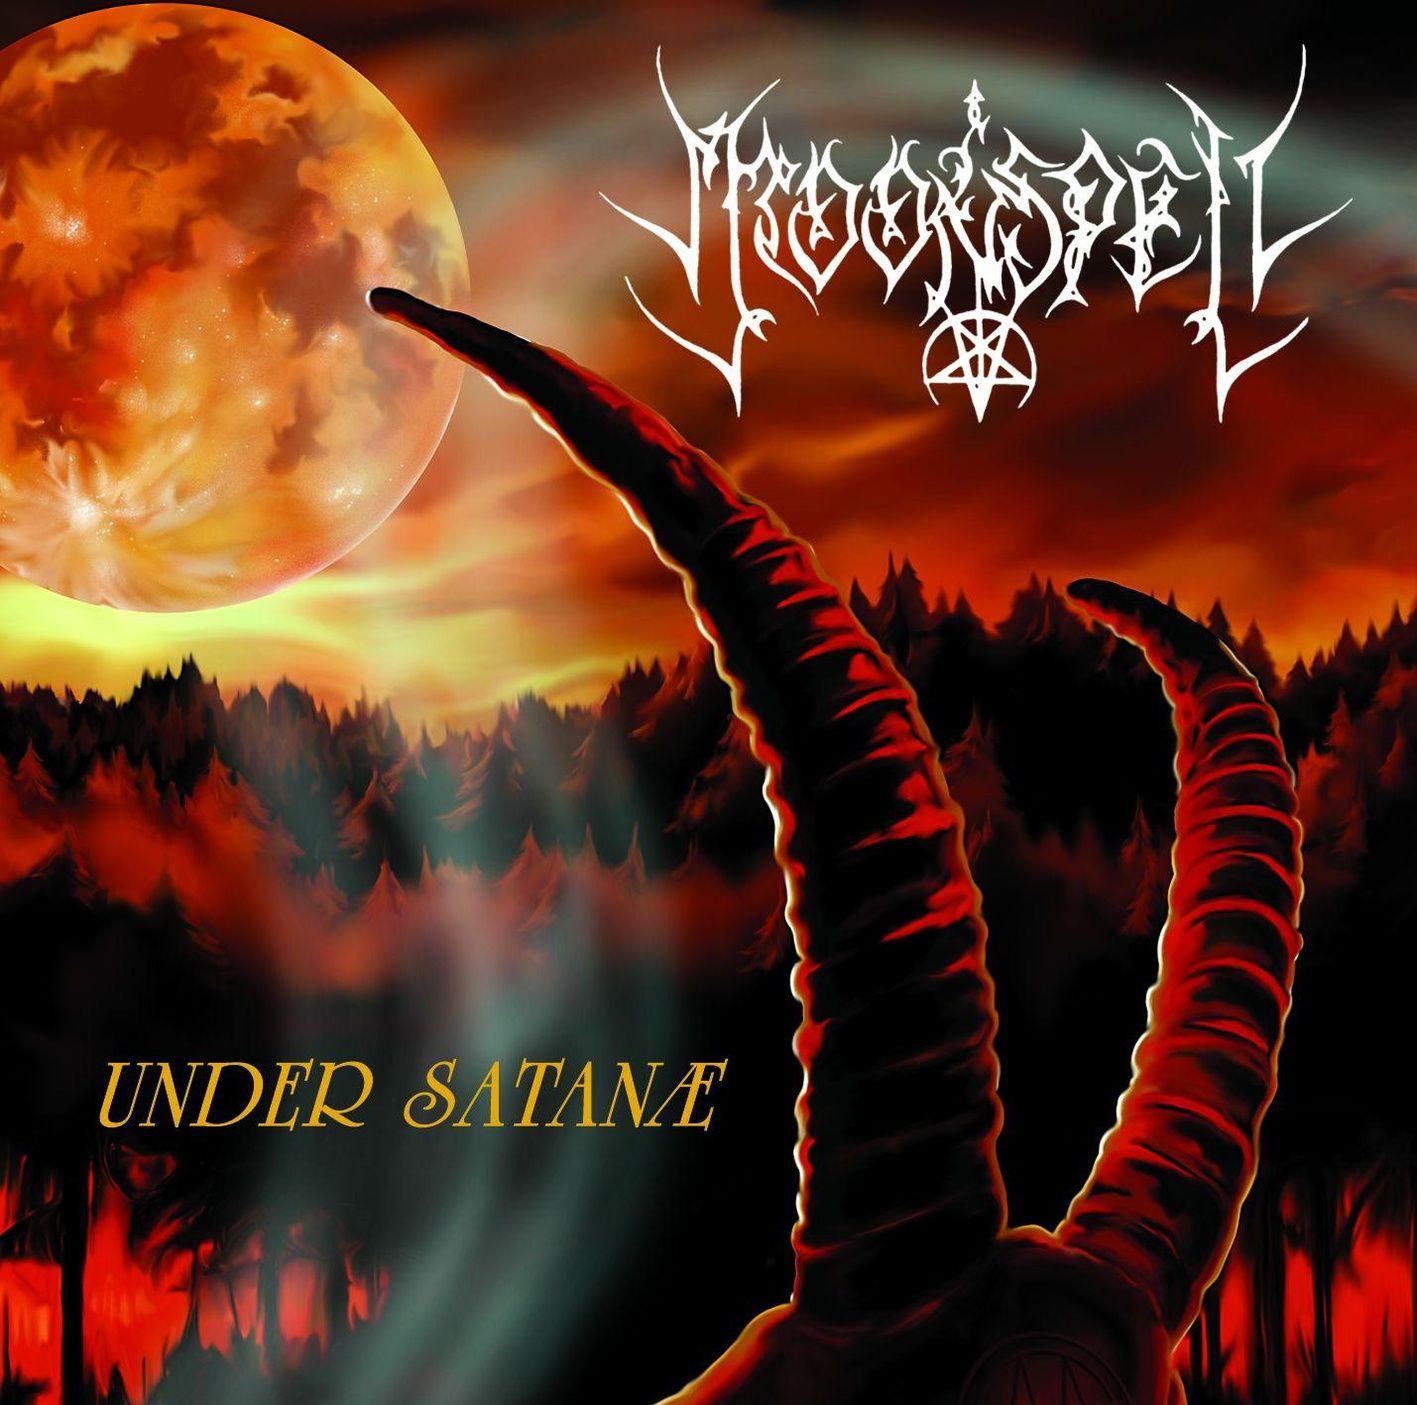 Moonspell - Under Satanae album cover